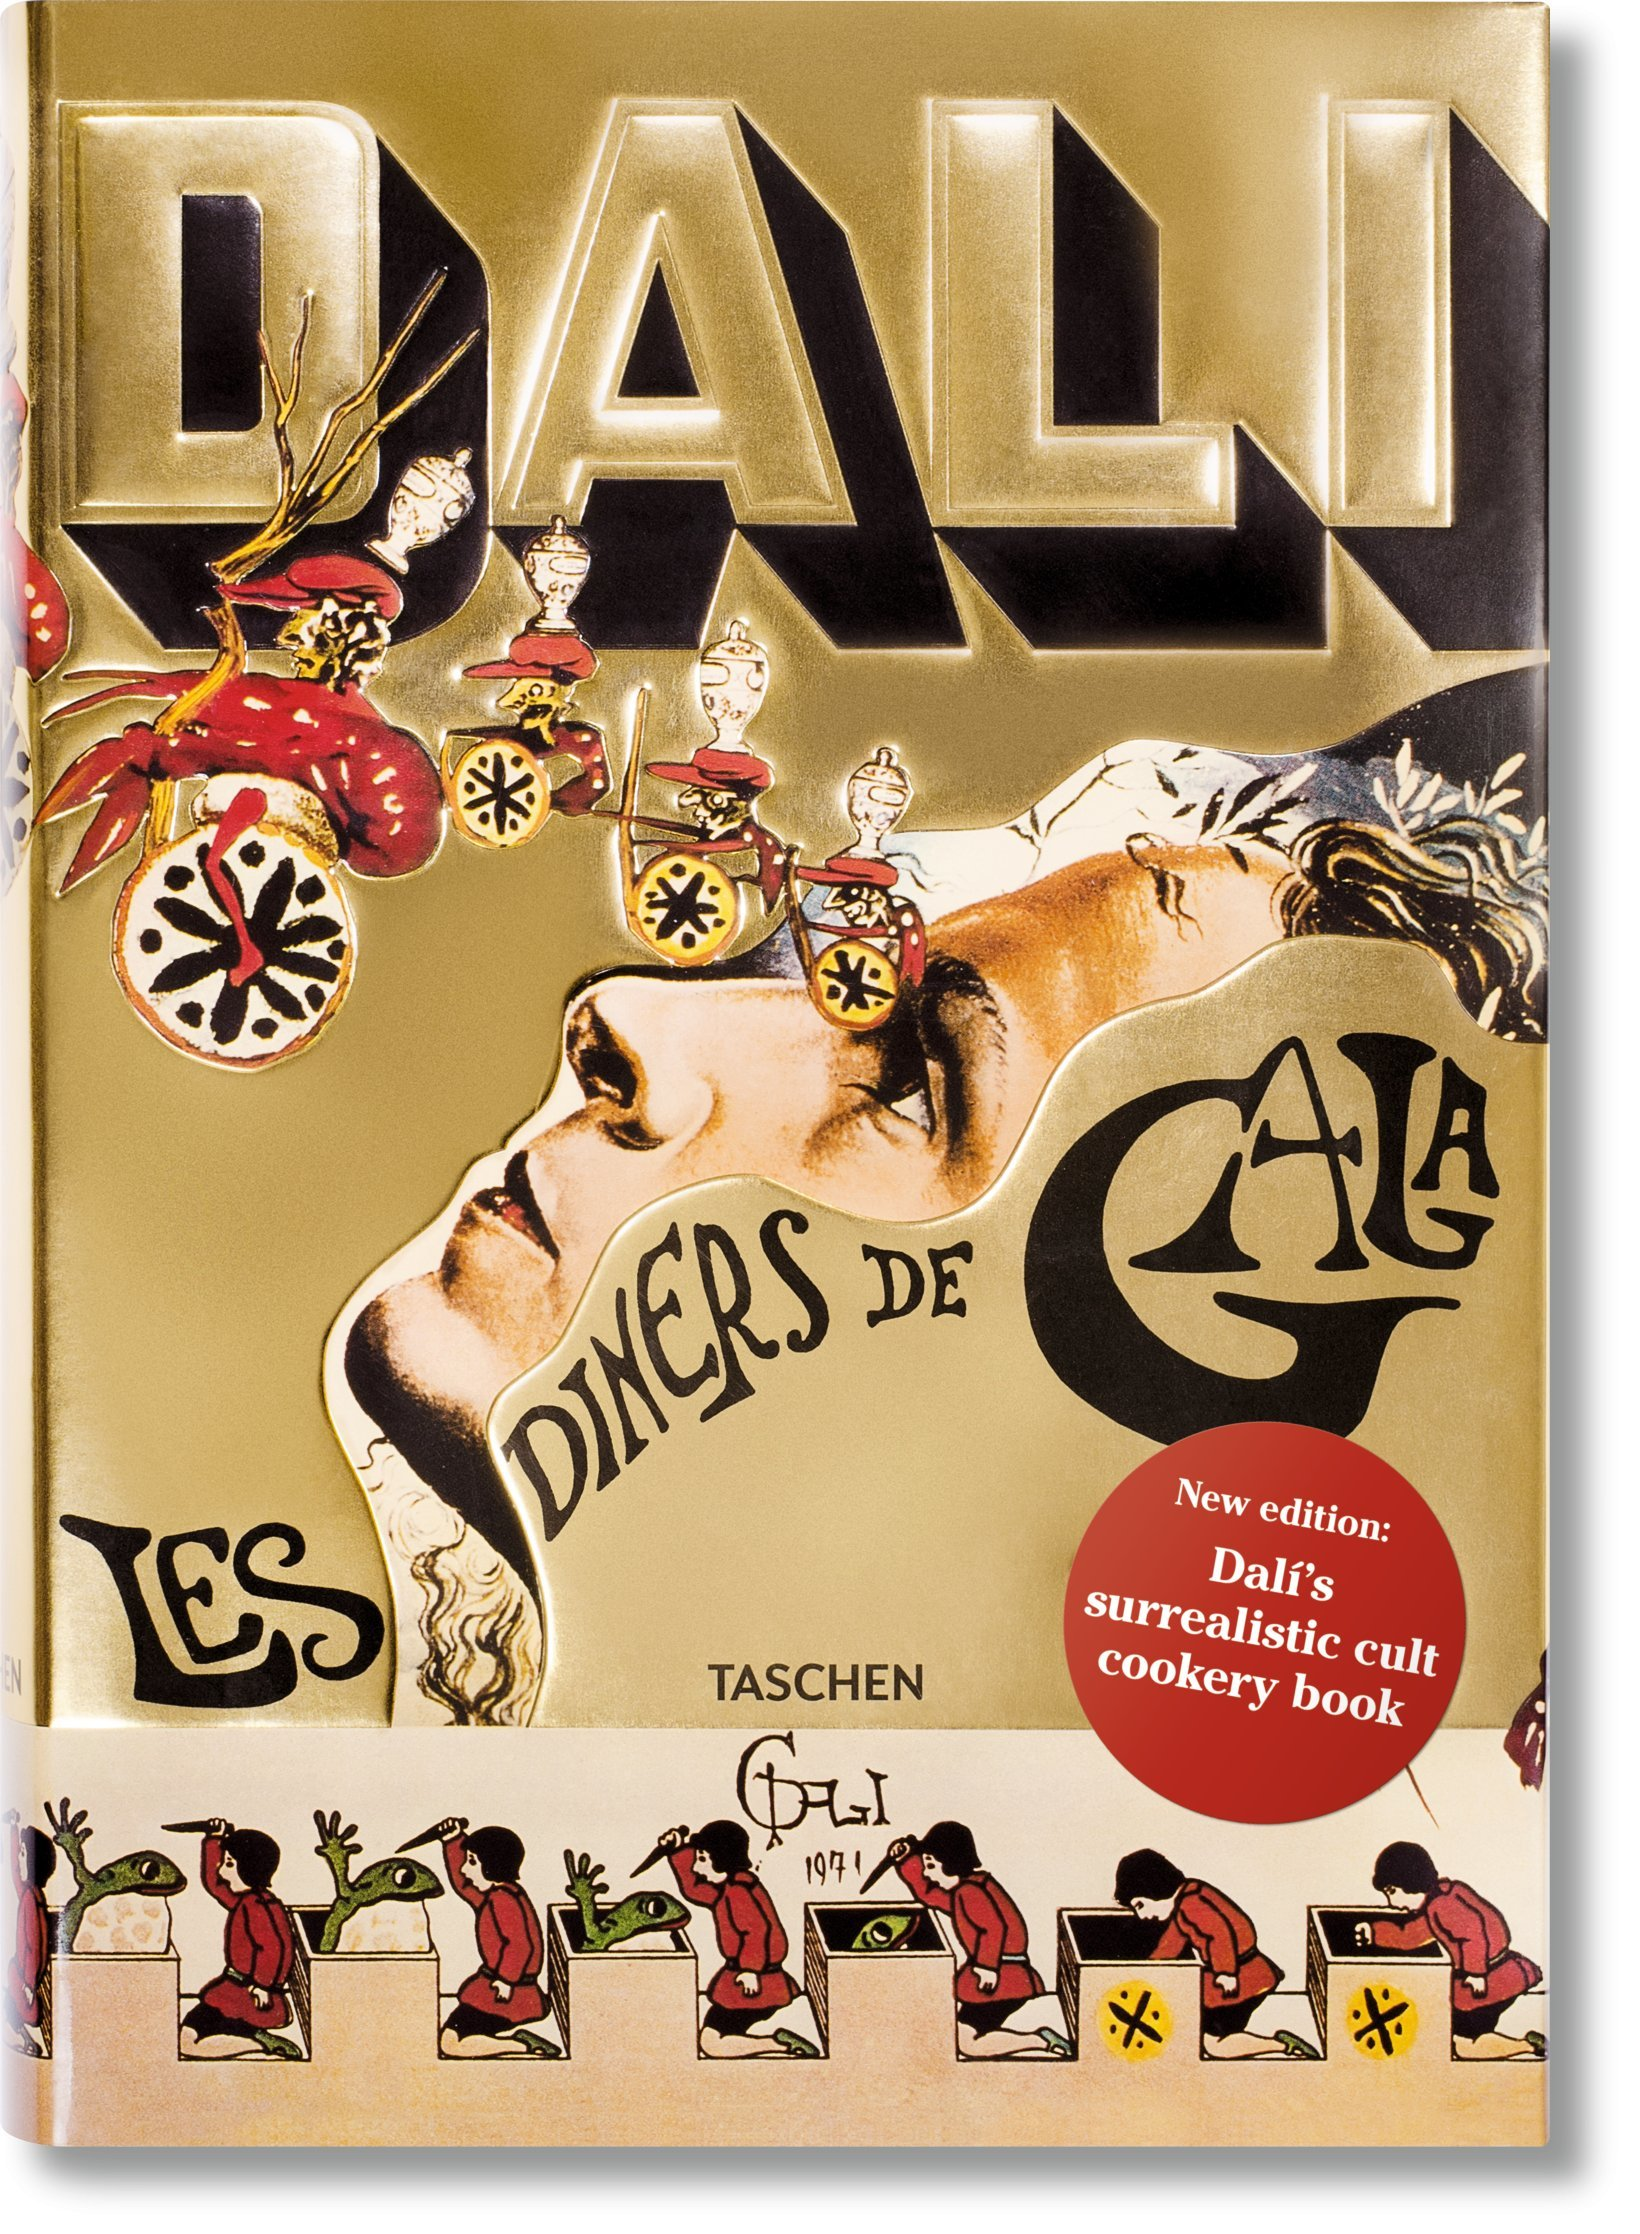 va-dali_diners_de_gala-cover_04639.jpg